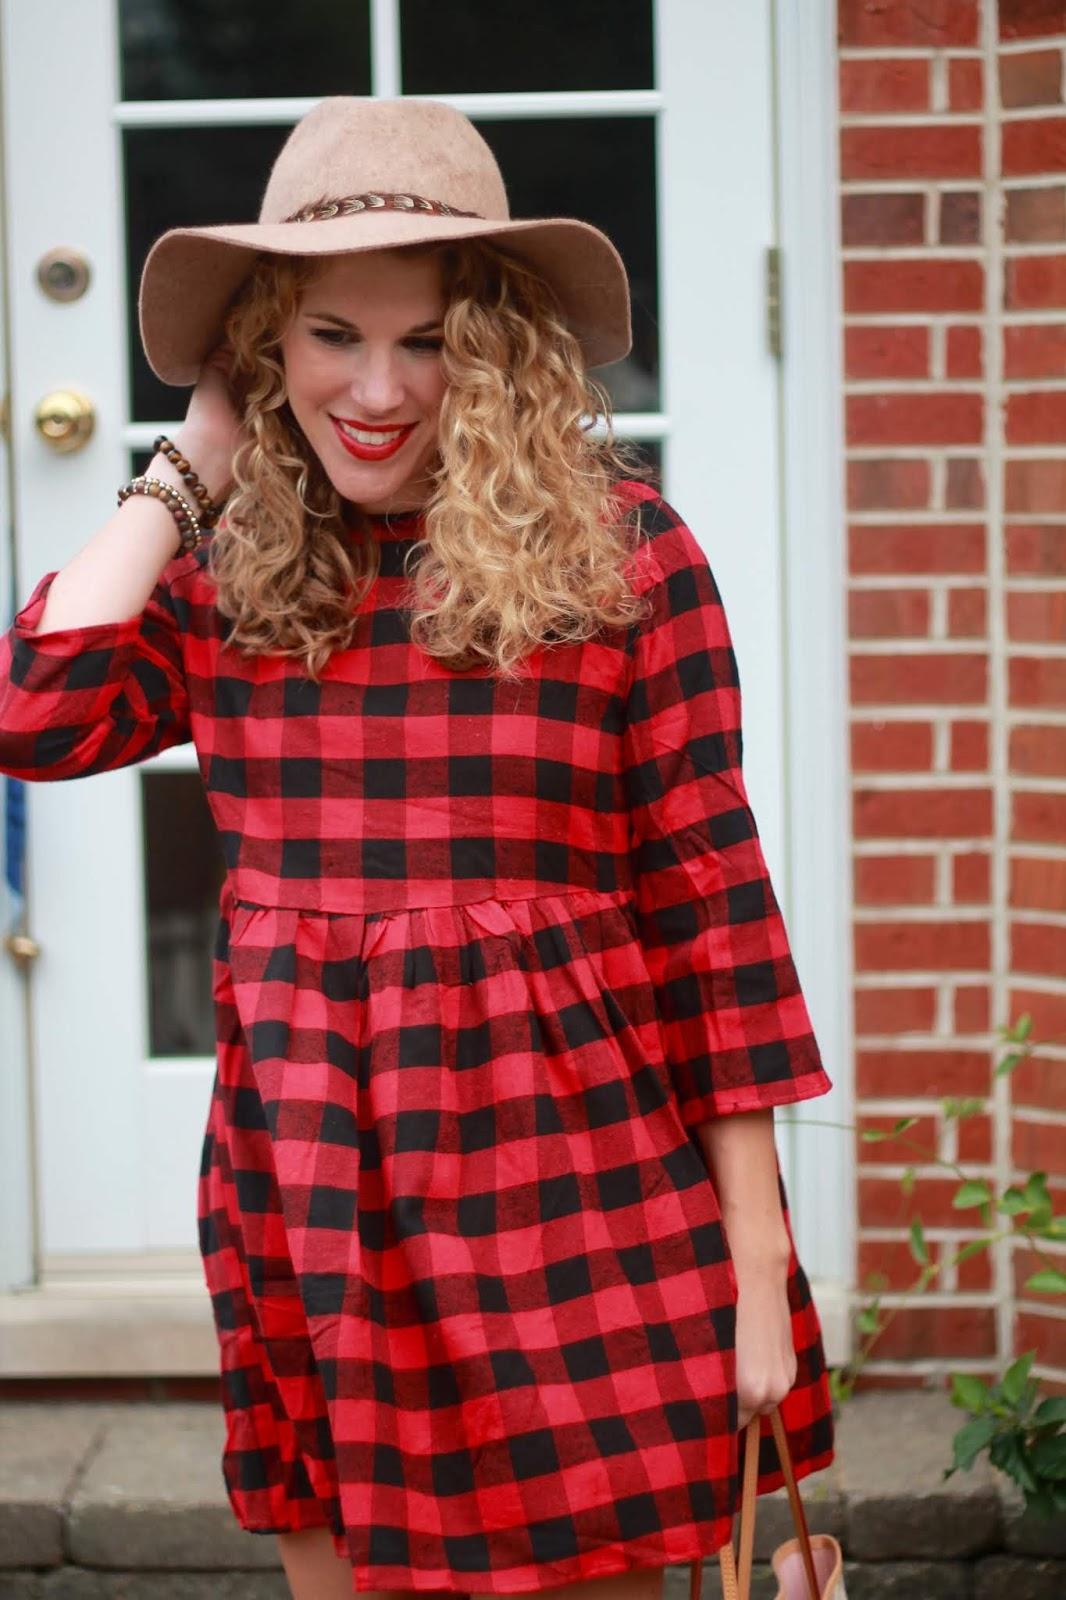 buffalo plaid dress, brown OTK boots, brown wide brim hat, LV azure neverfull